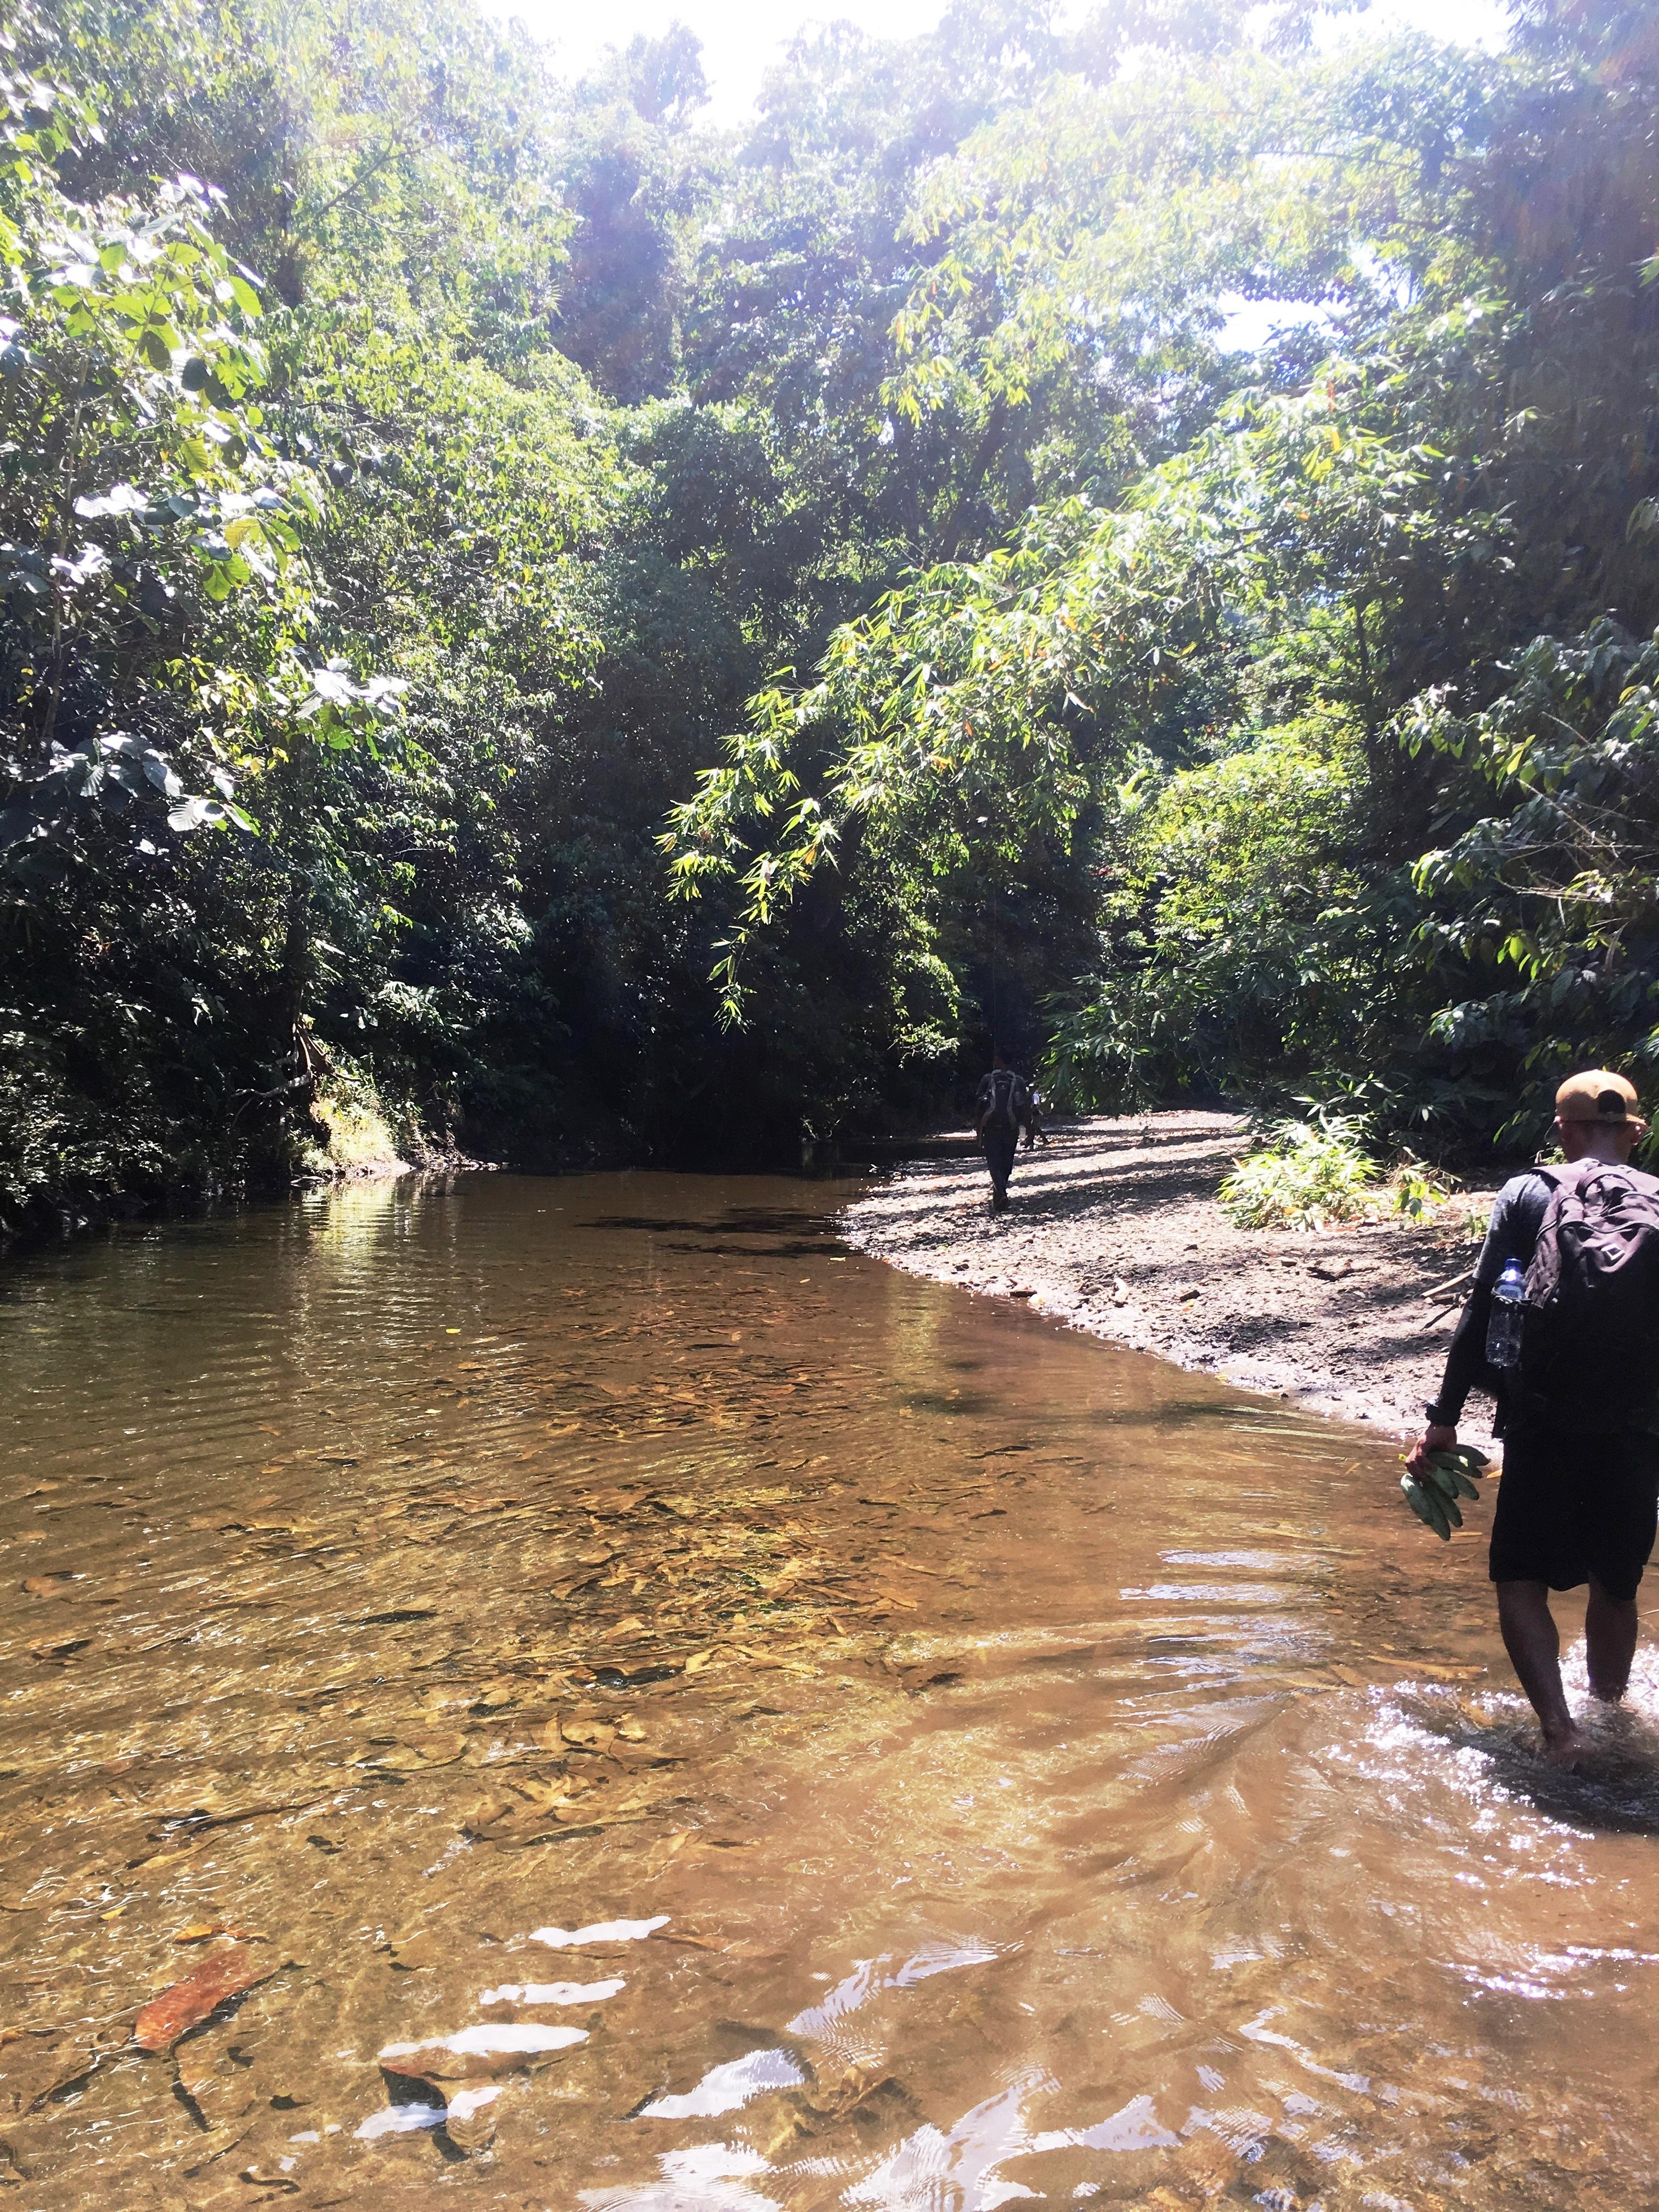 Gunung-Sabatai-Wading-up-Malako-River-in-dry-season-Nick-Hughes-September-2019